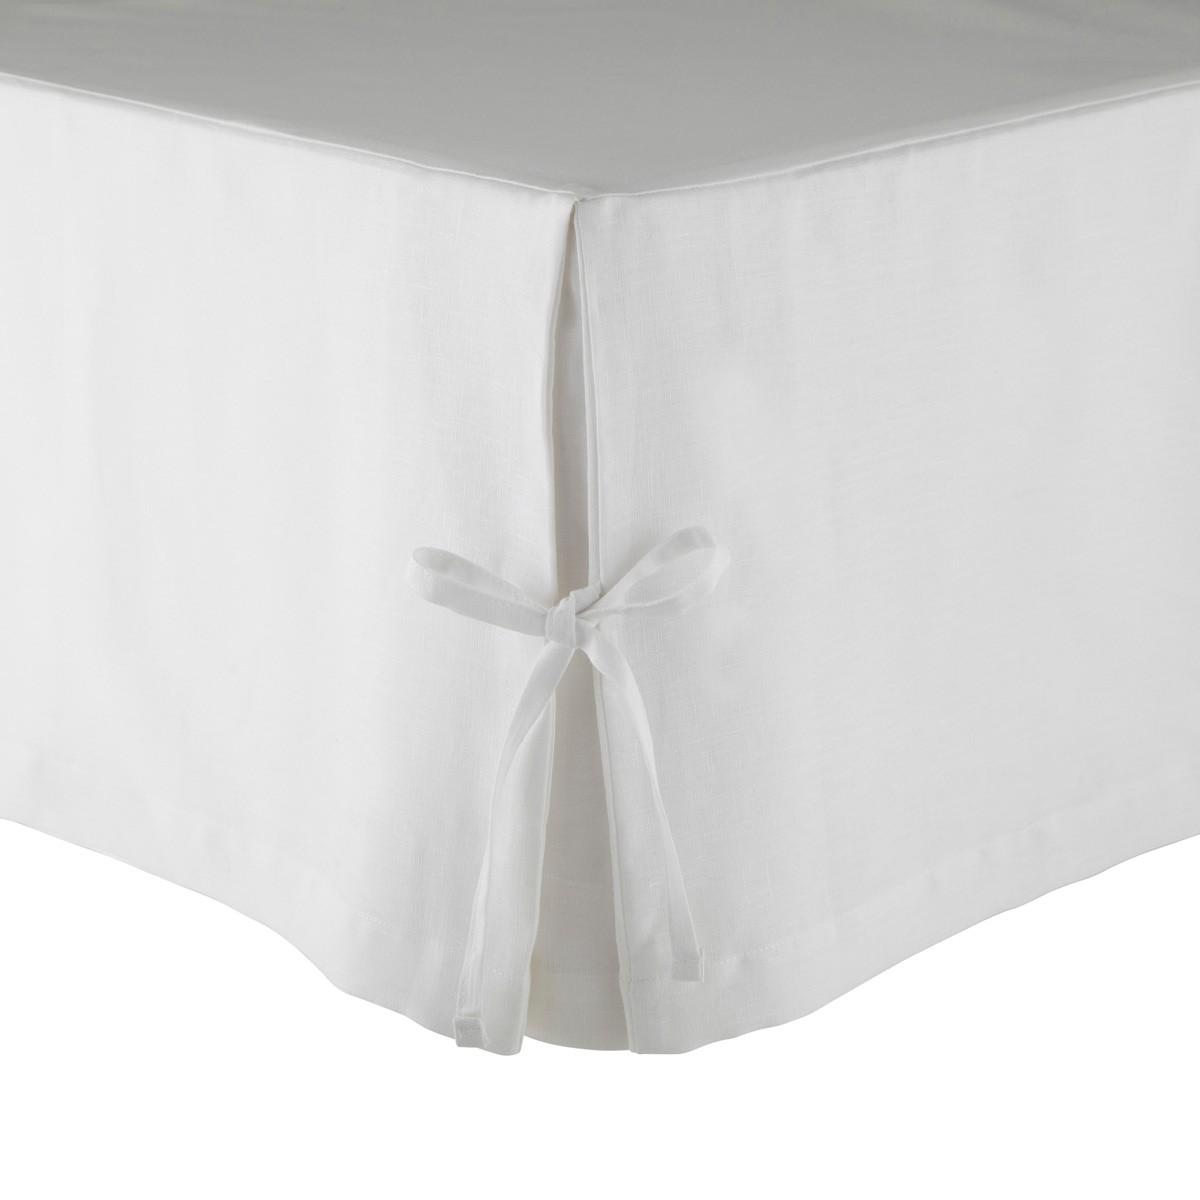 Cache sommier Lin Blanc 140 x 200 cm (photo)